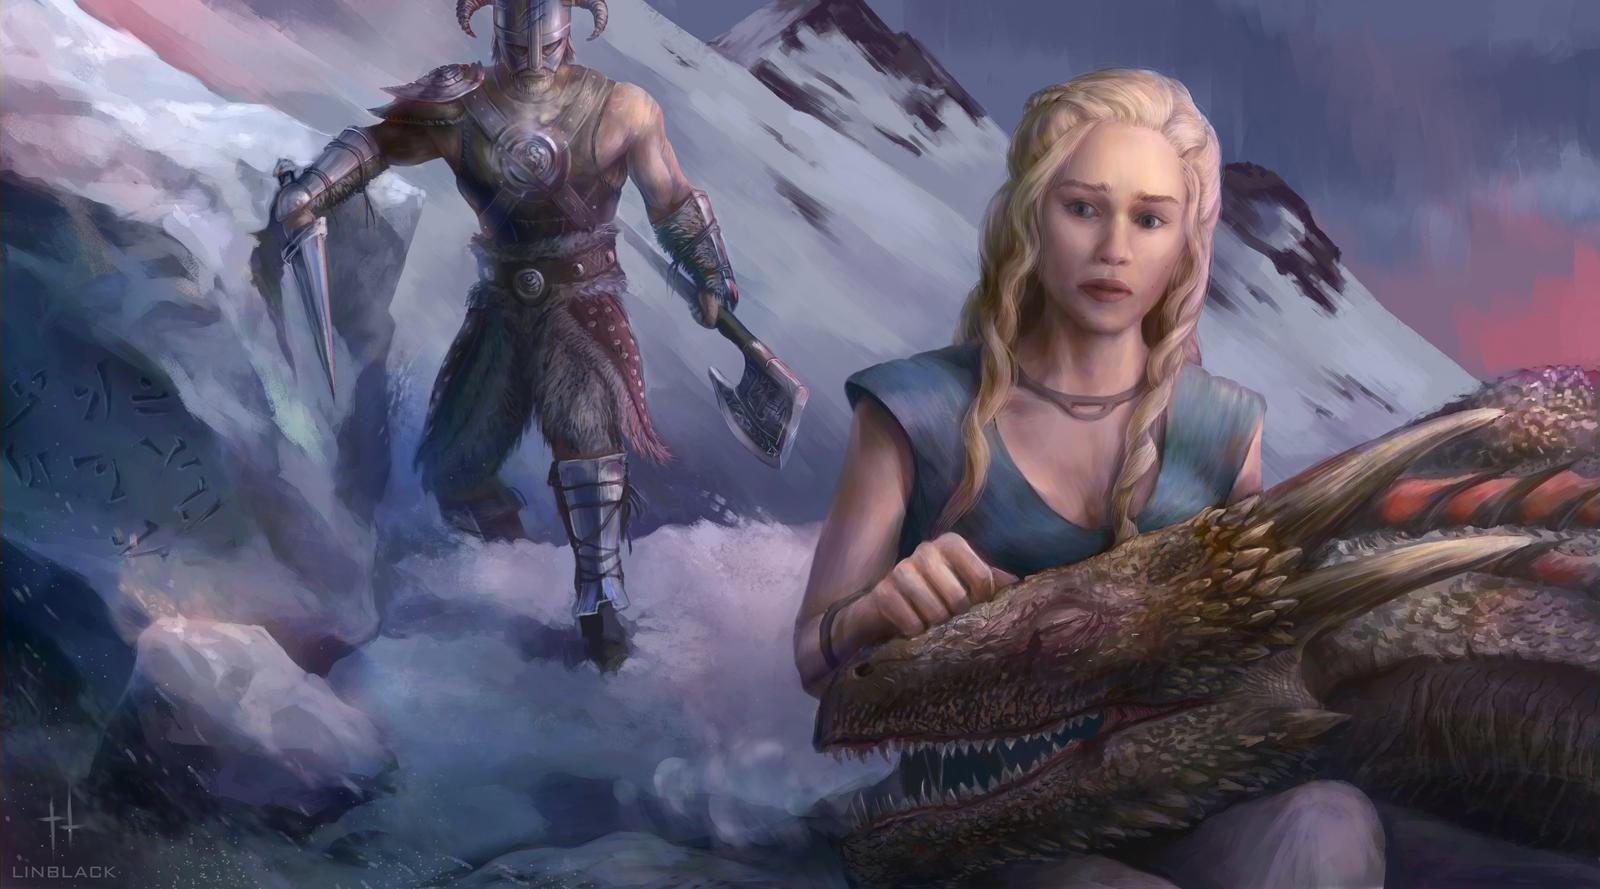 Daenerys vs Dragonborn by Linblack